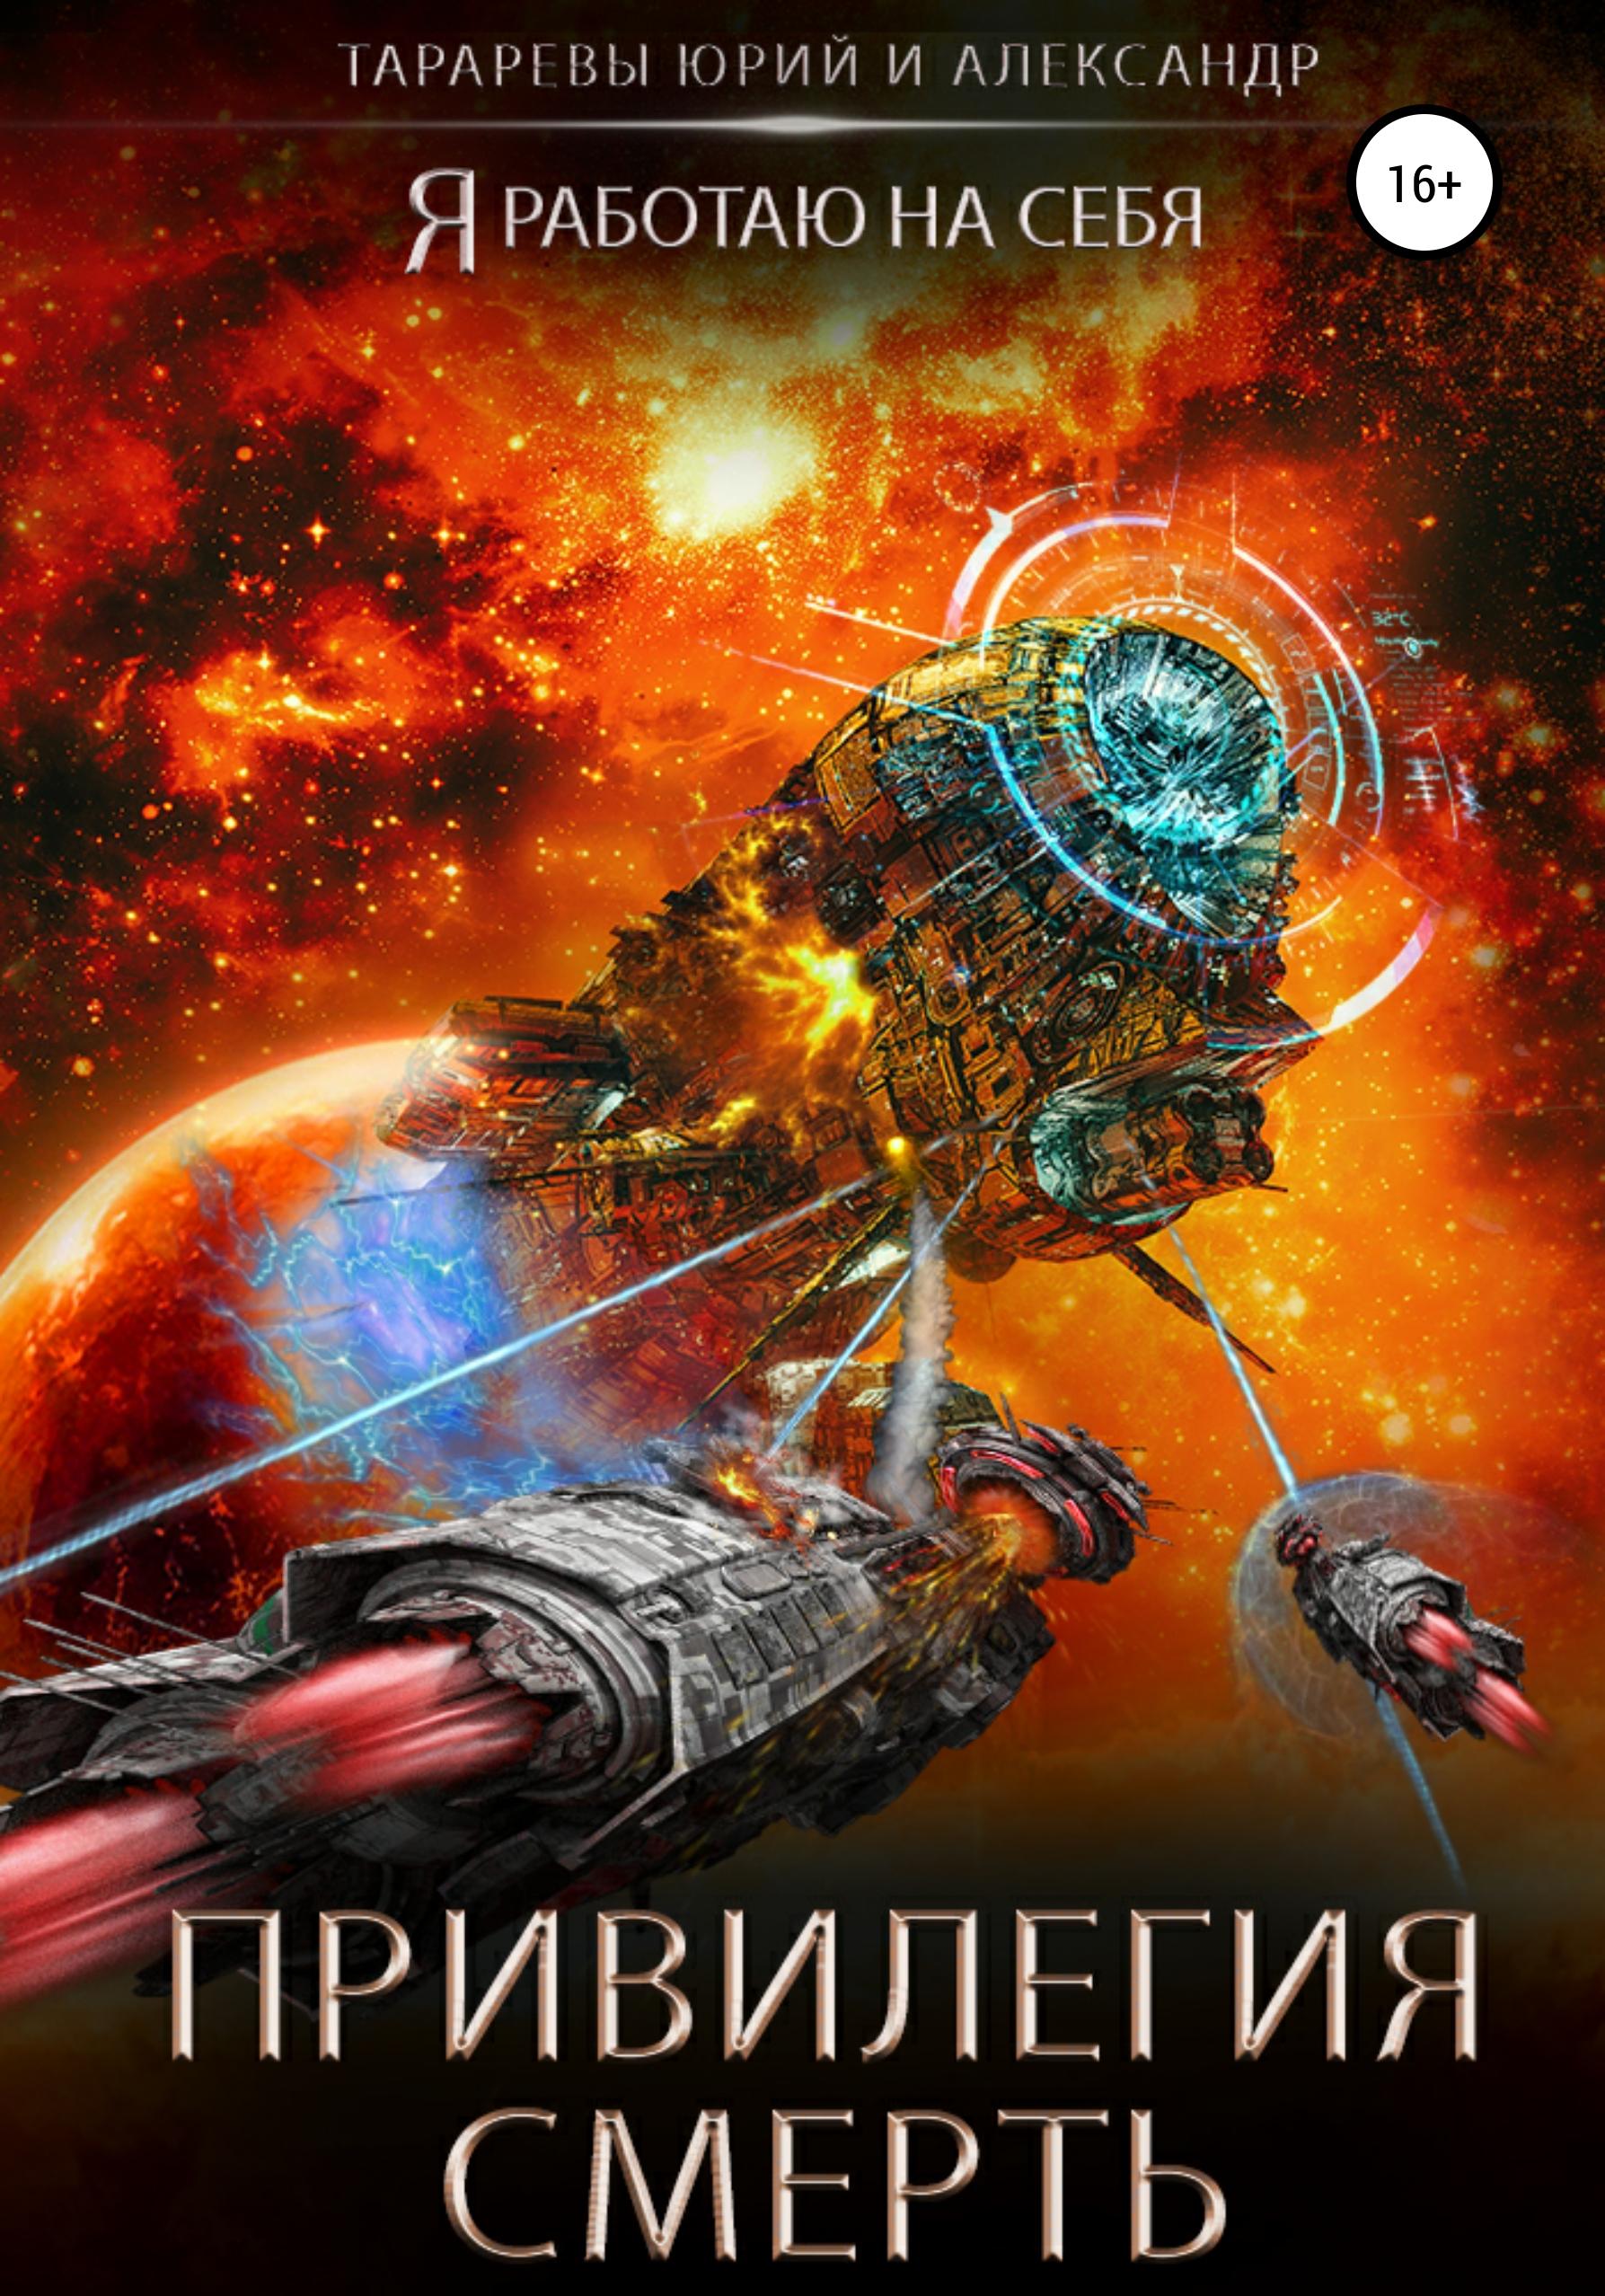 Юрий Тарарев, Александр Тарарев «Привилегия смерть»